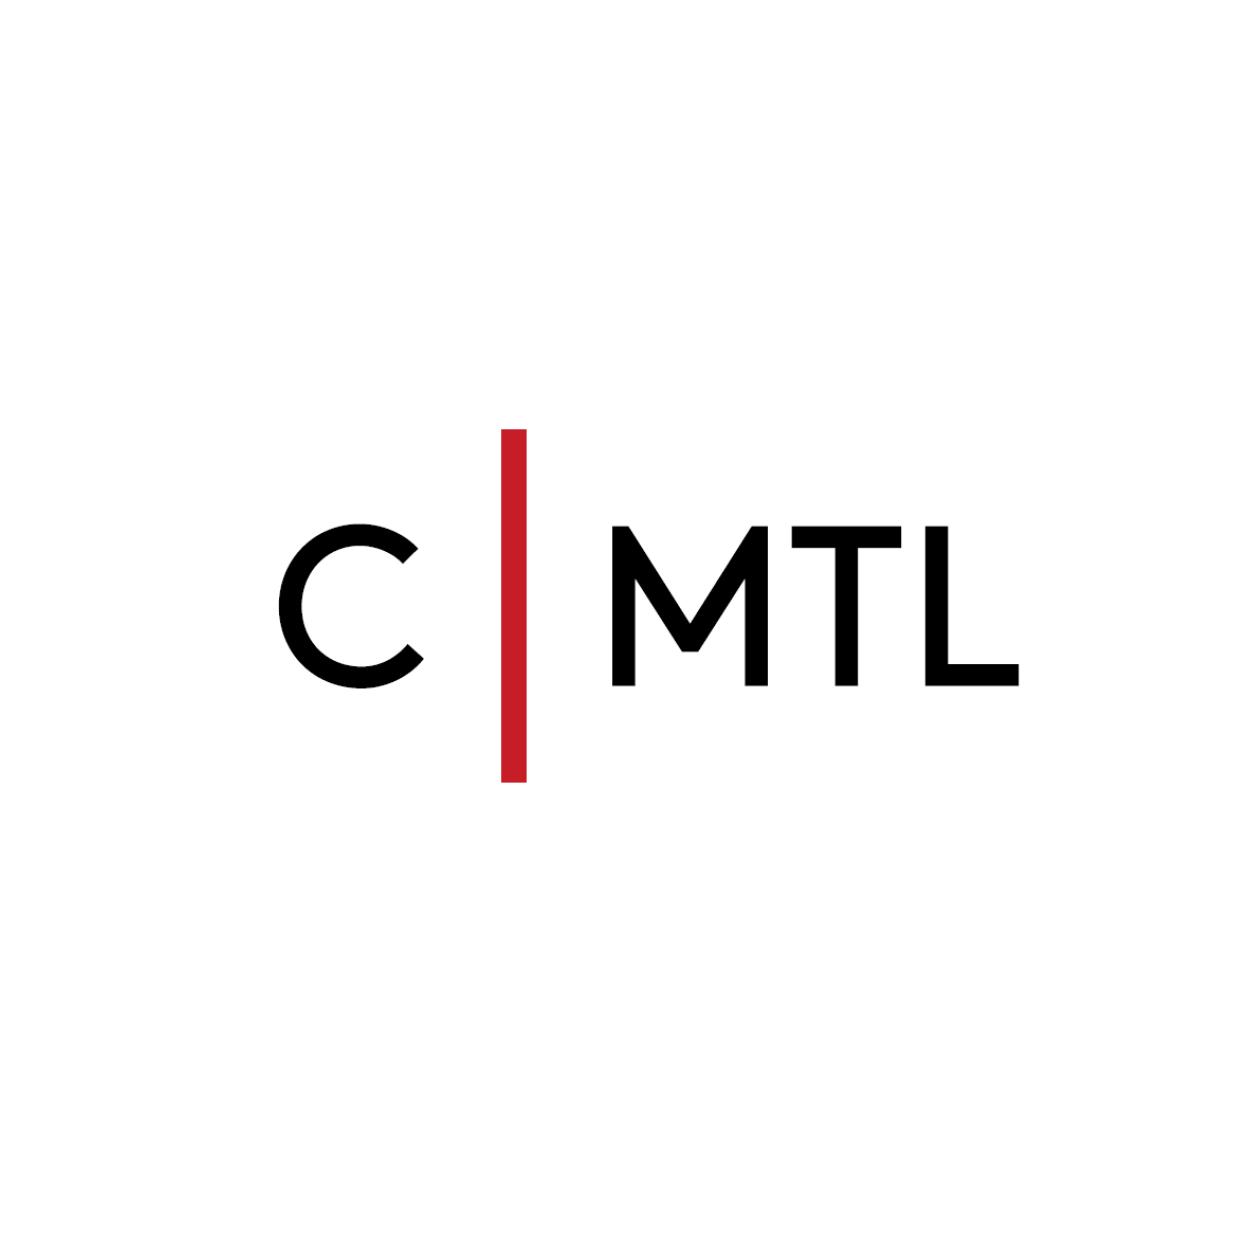 logo cmtl